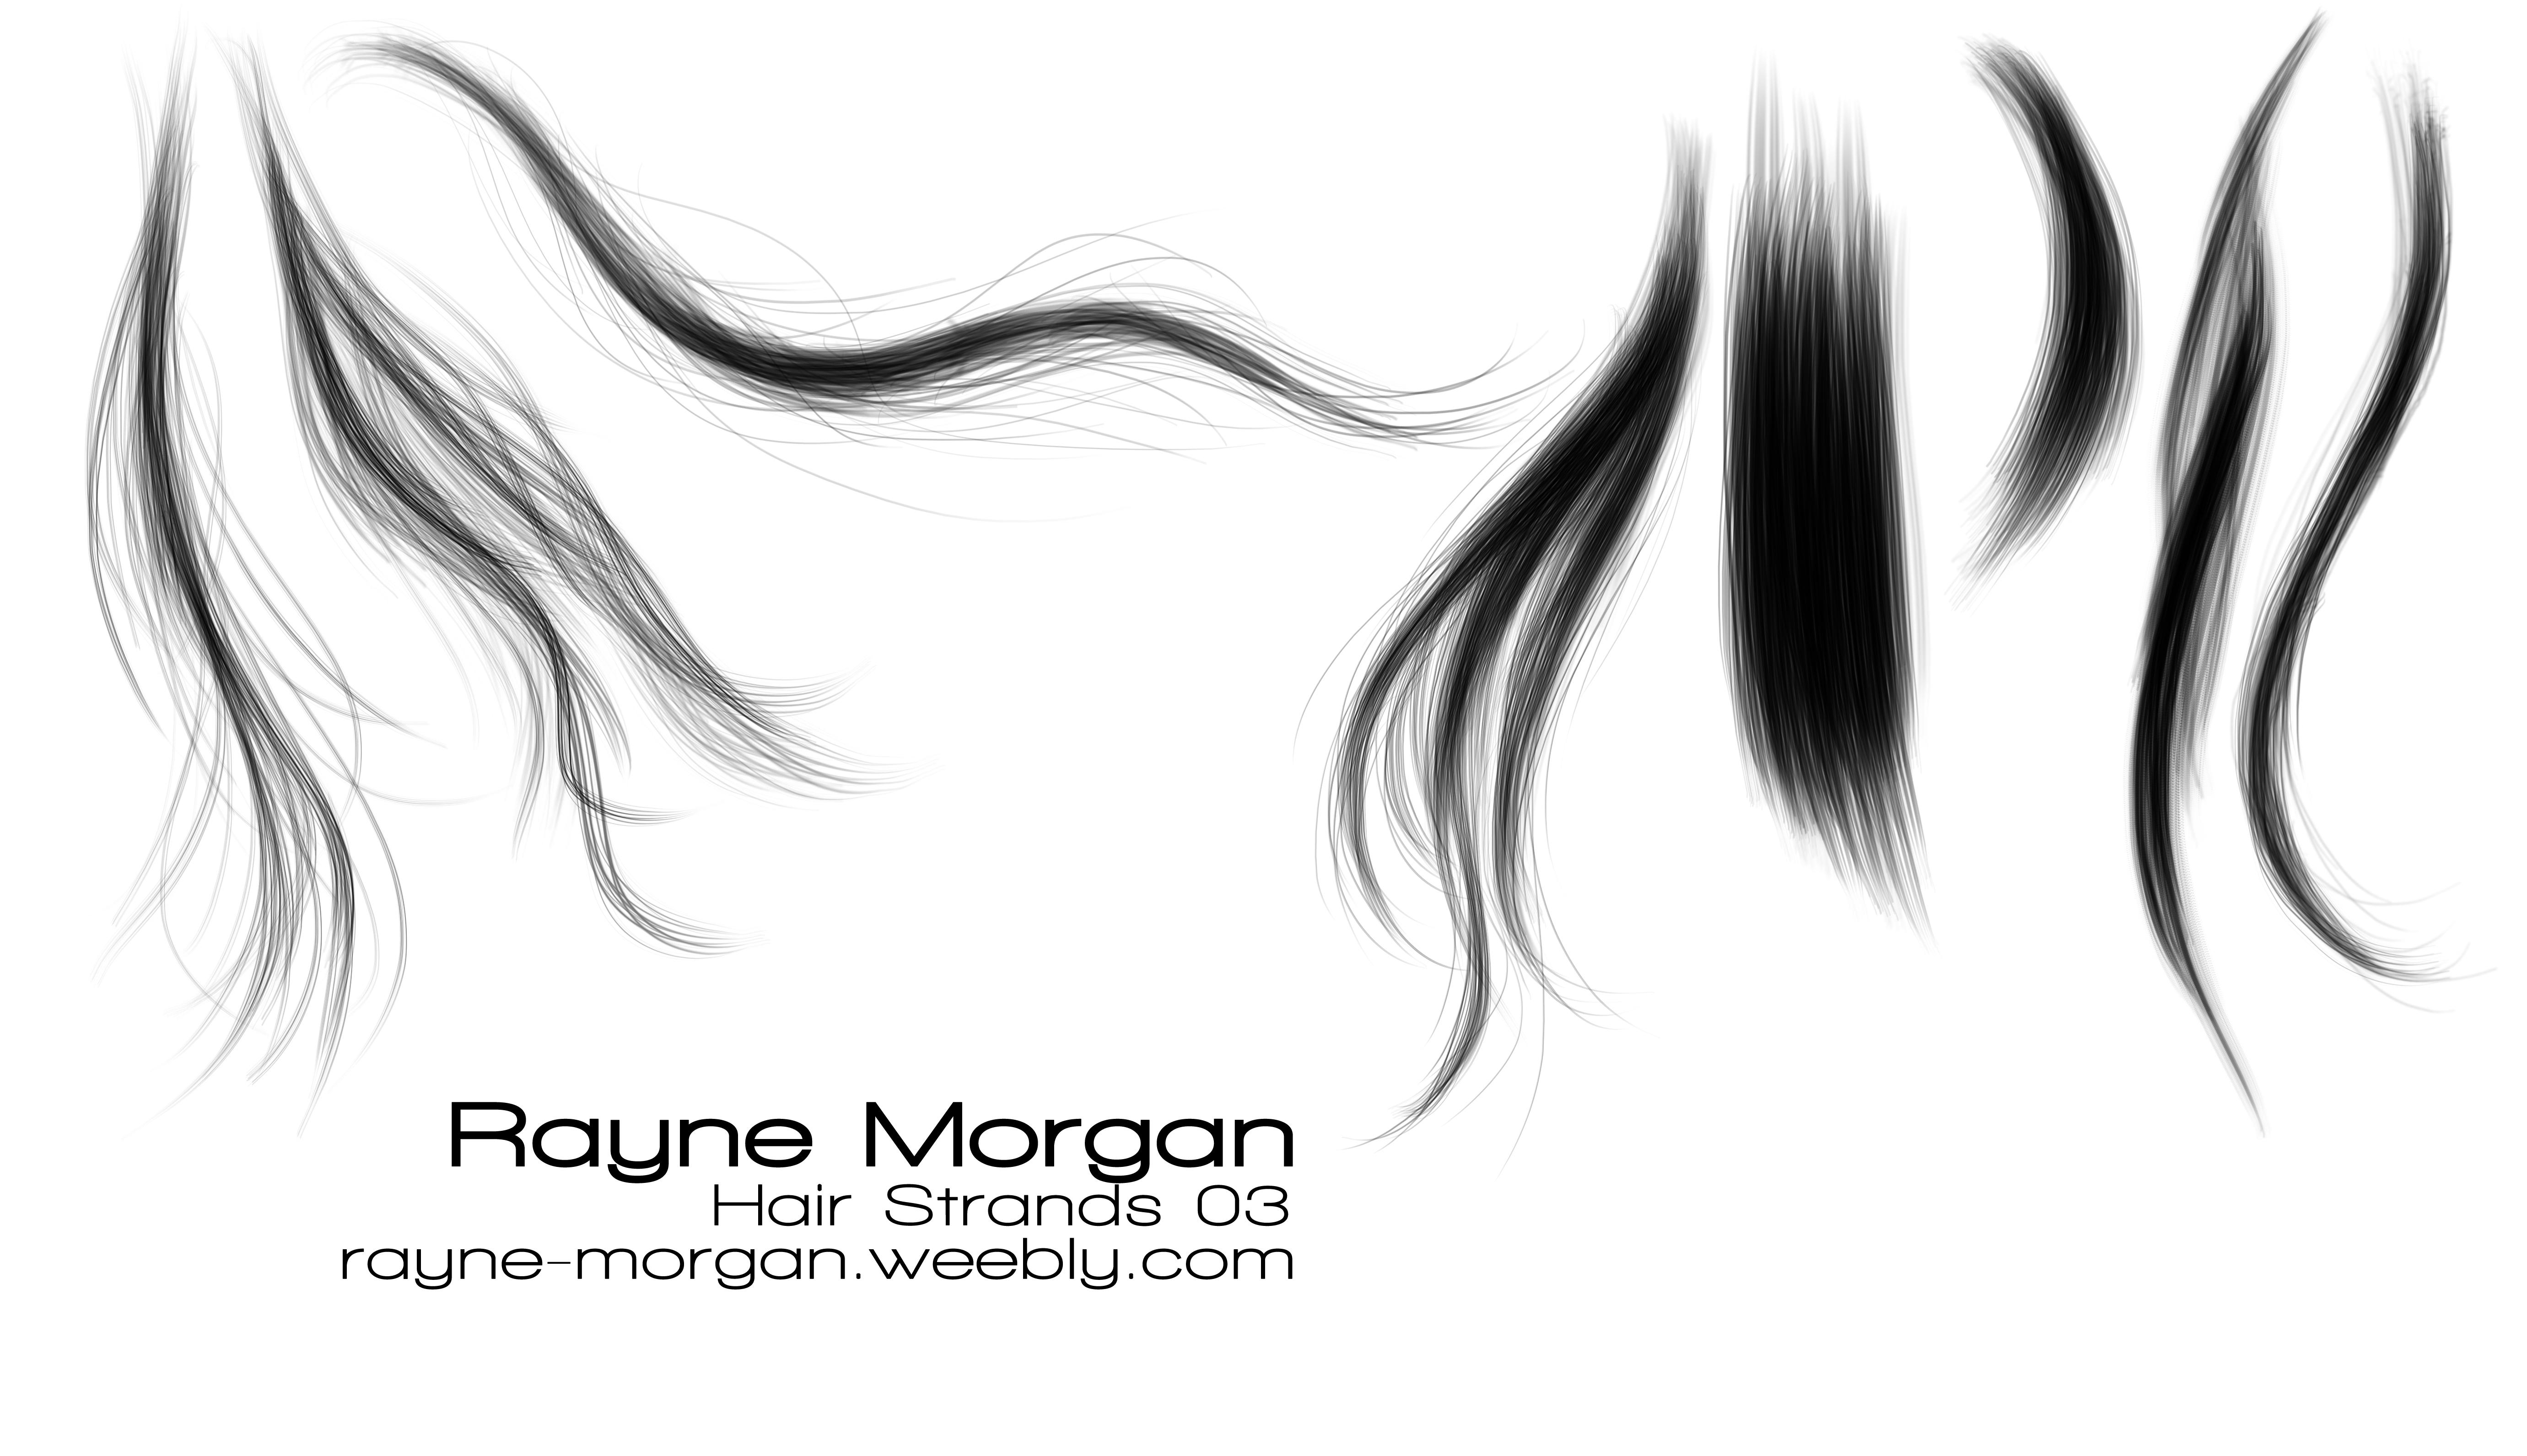 RM - Hair Strands 03 by RayneMorgan